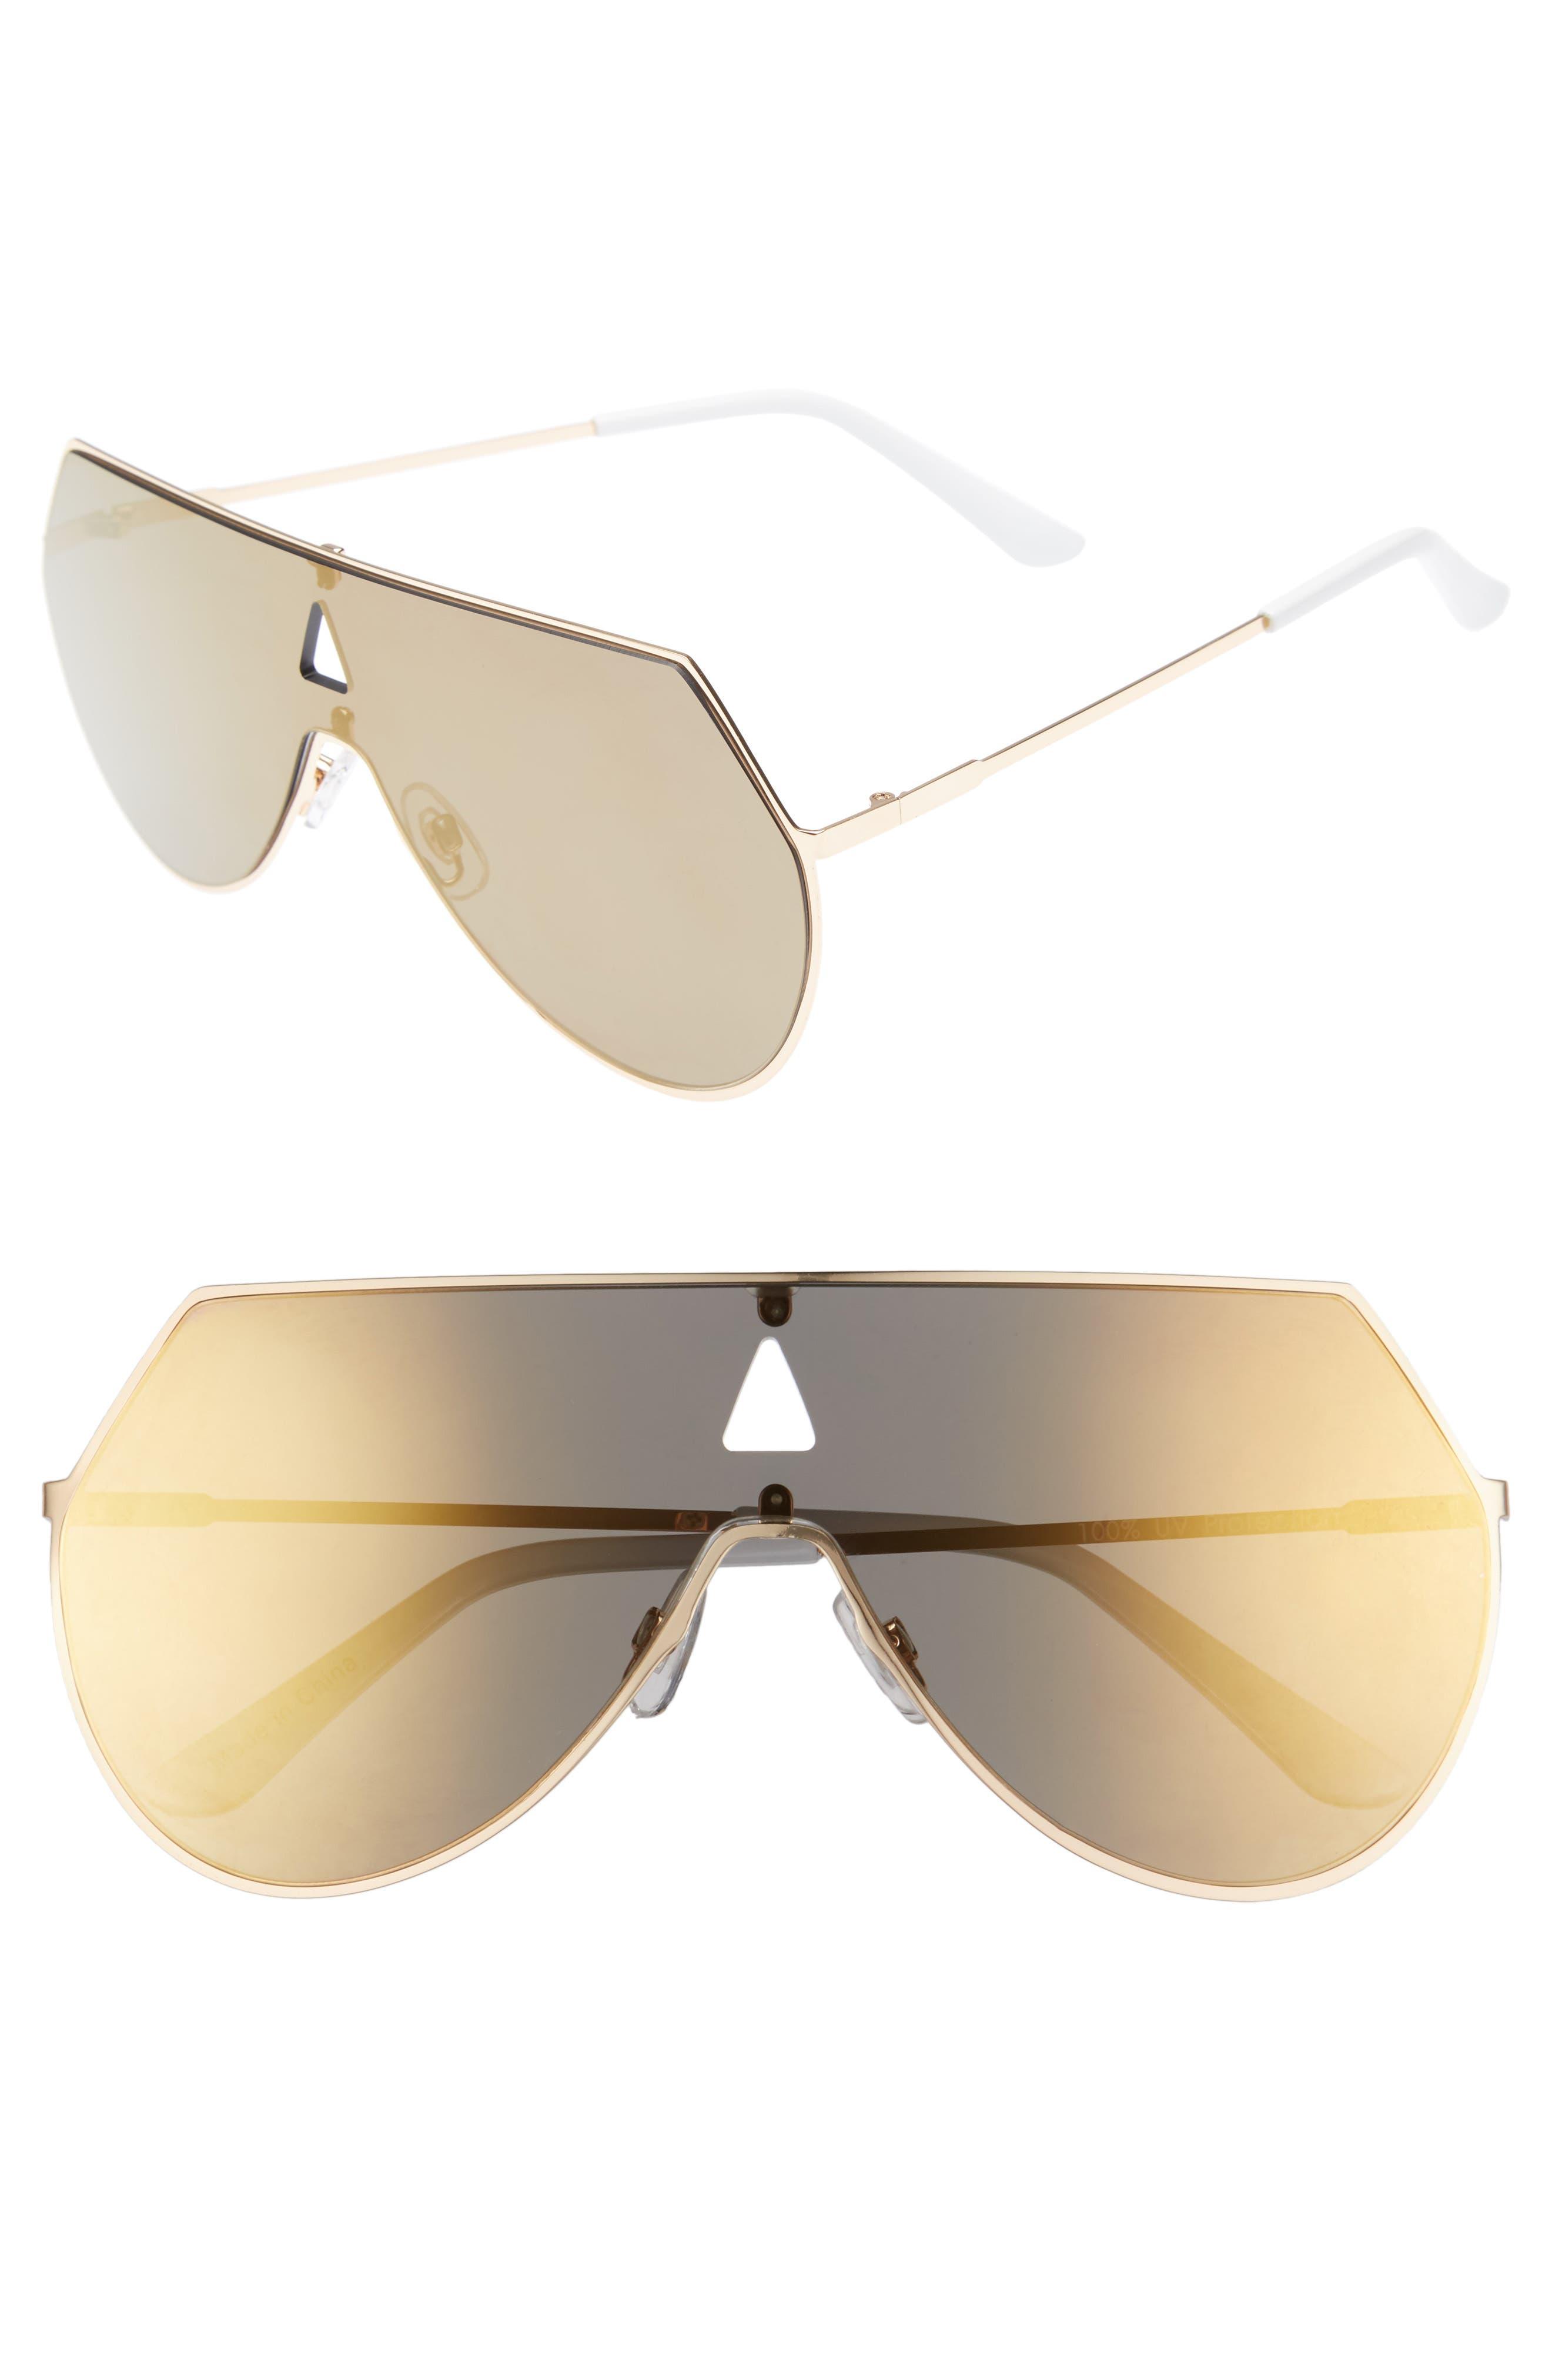 60mm Flat Lens Aviator Sunglasses,                         Main,                         color, Gold